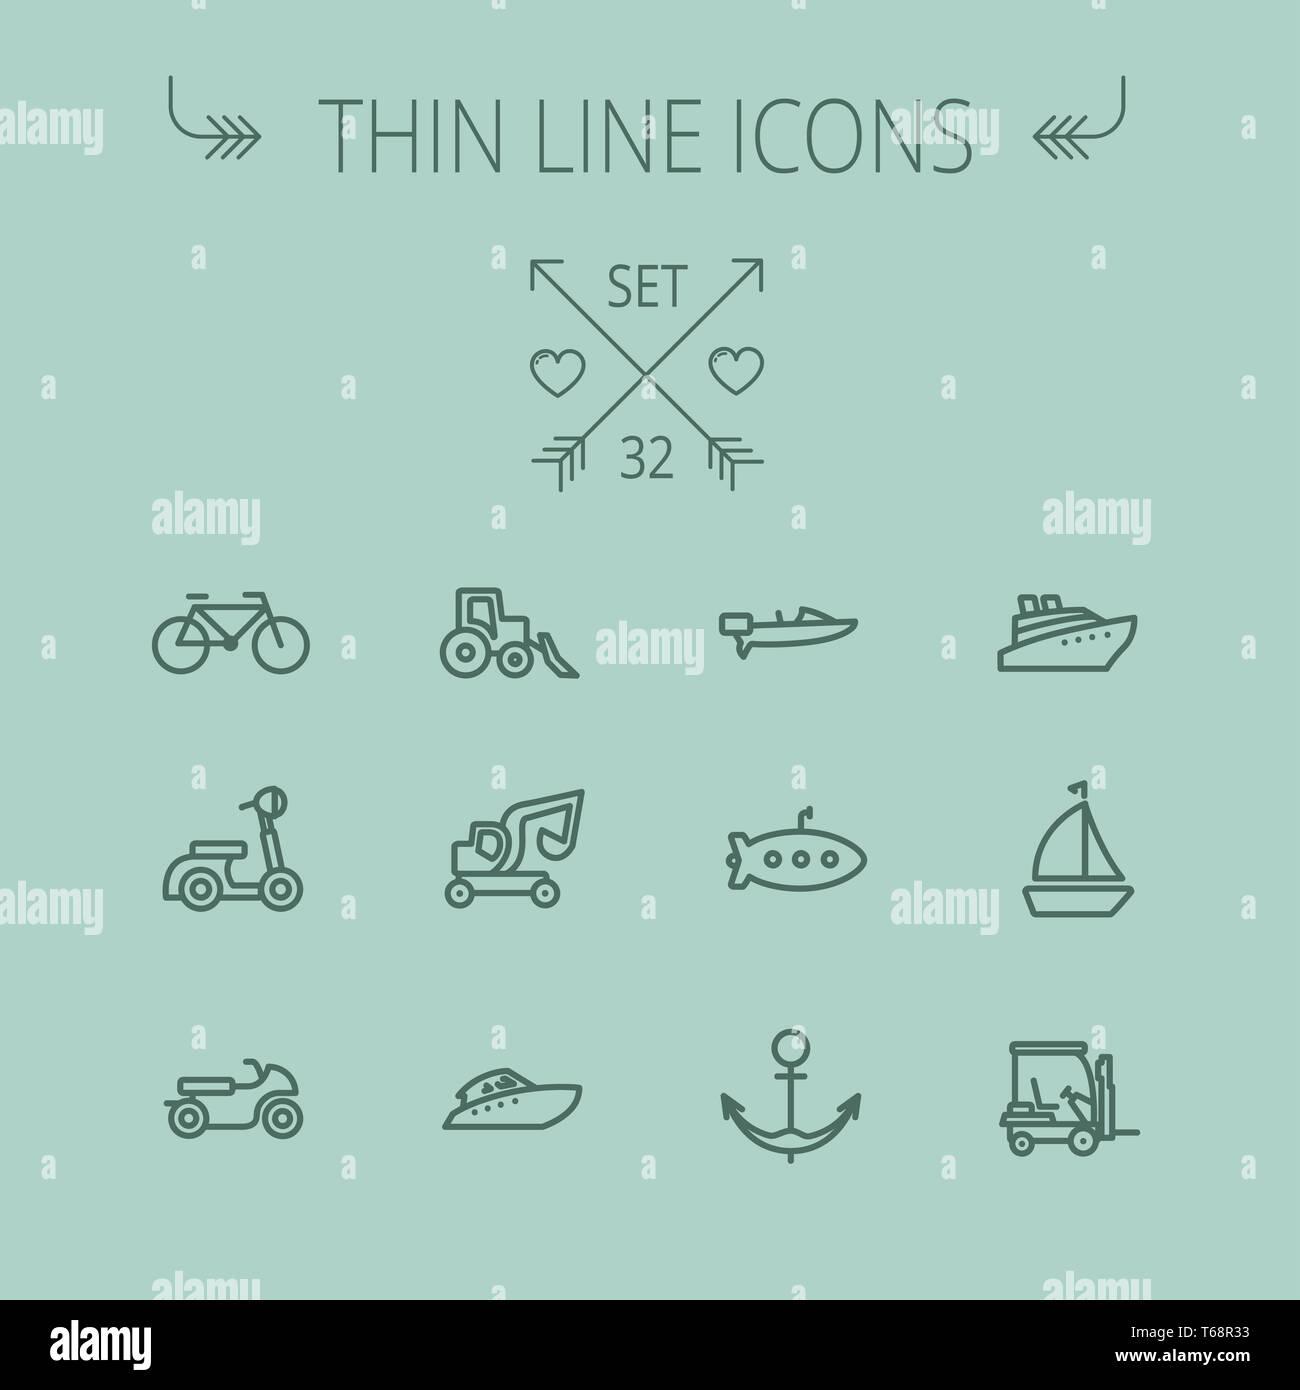 Transportation thin line icon set - Stock Image